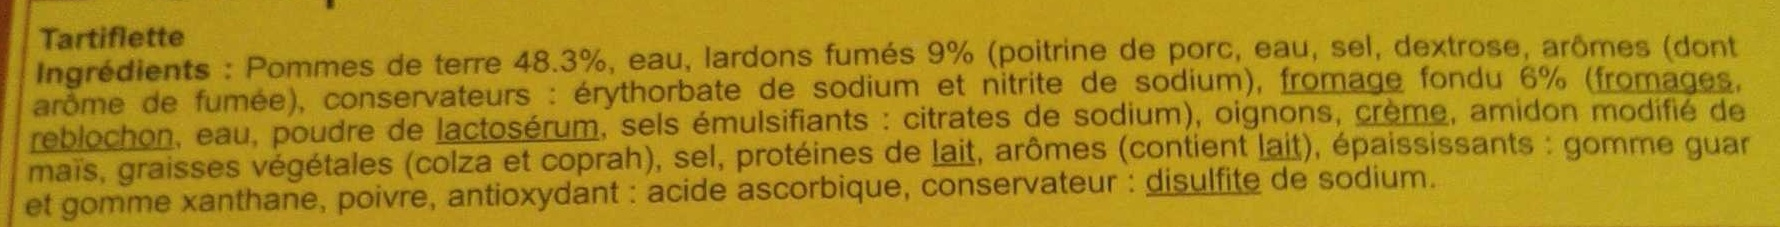 Tartiflette - Ingrédients